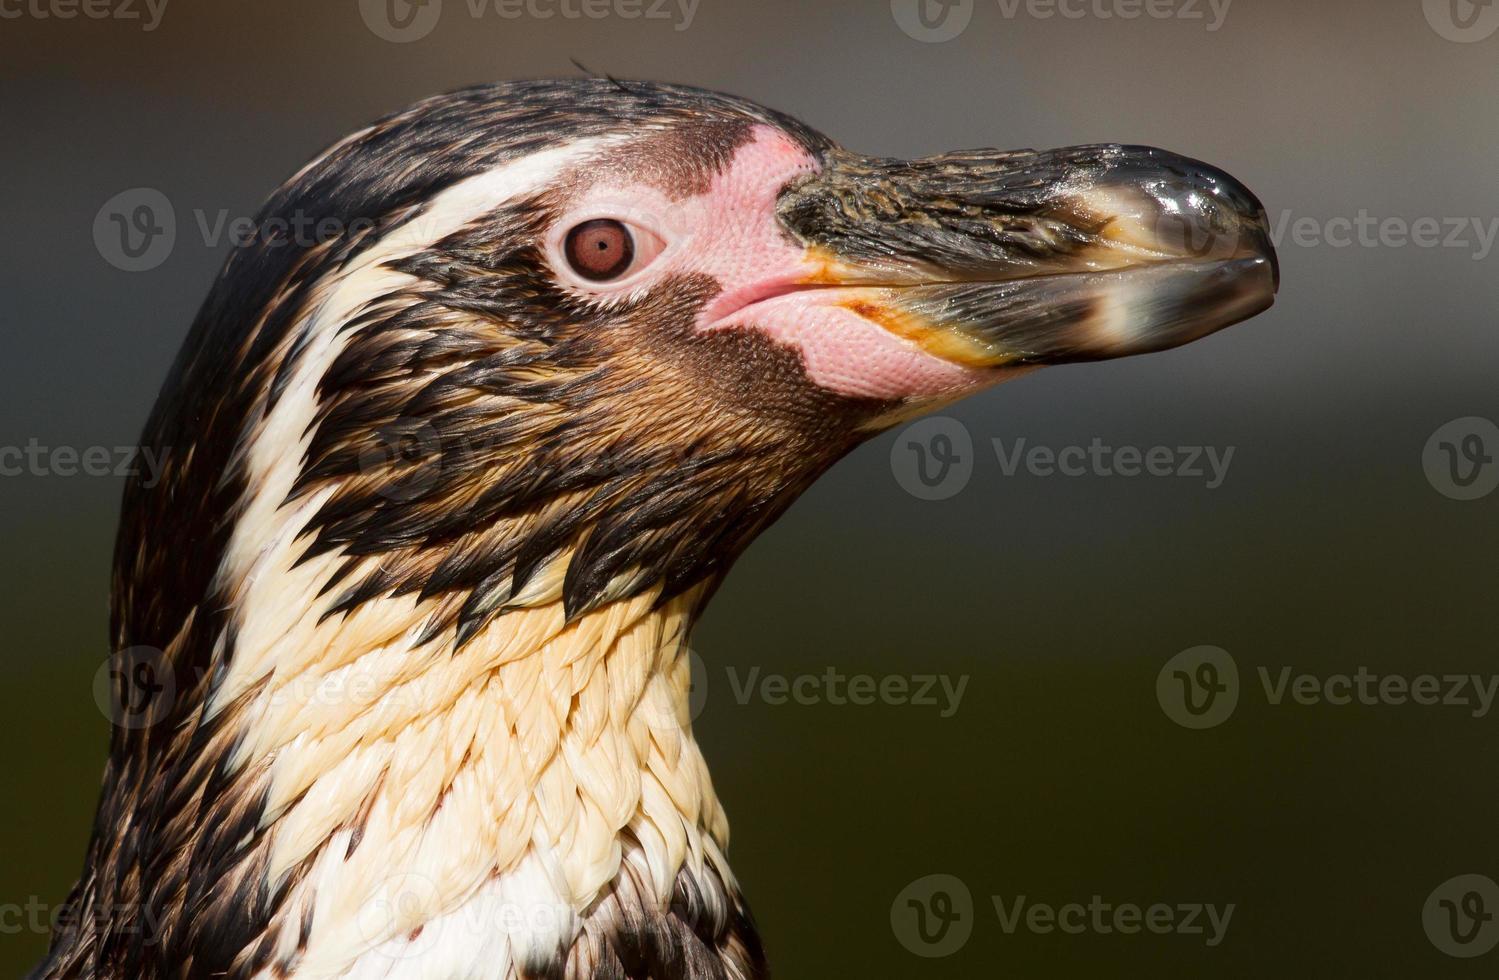 Humboldt penguin photo